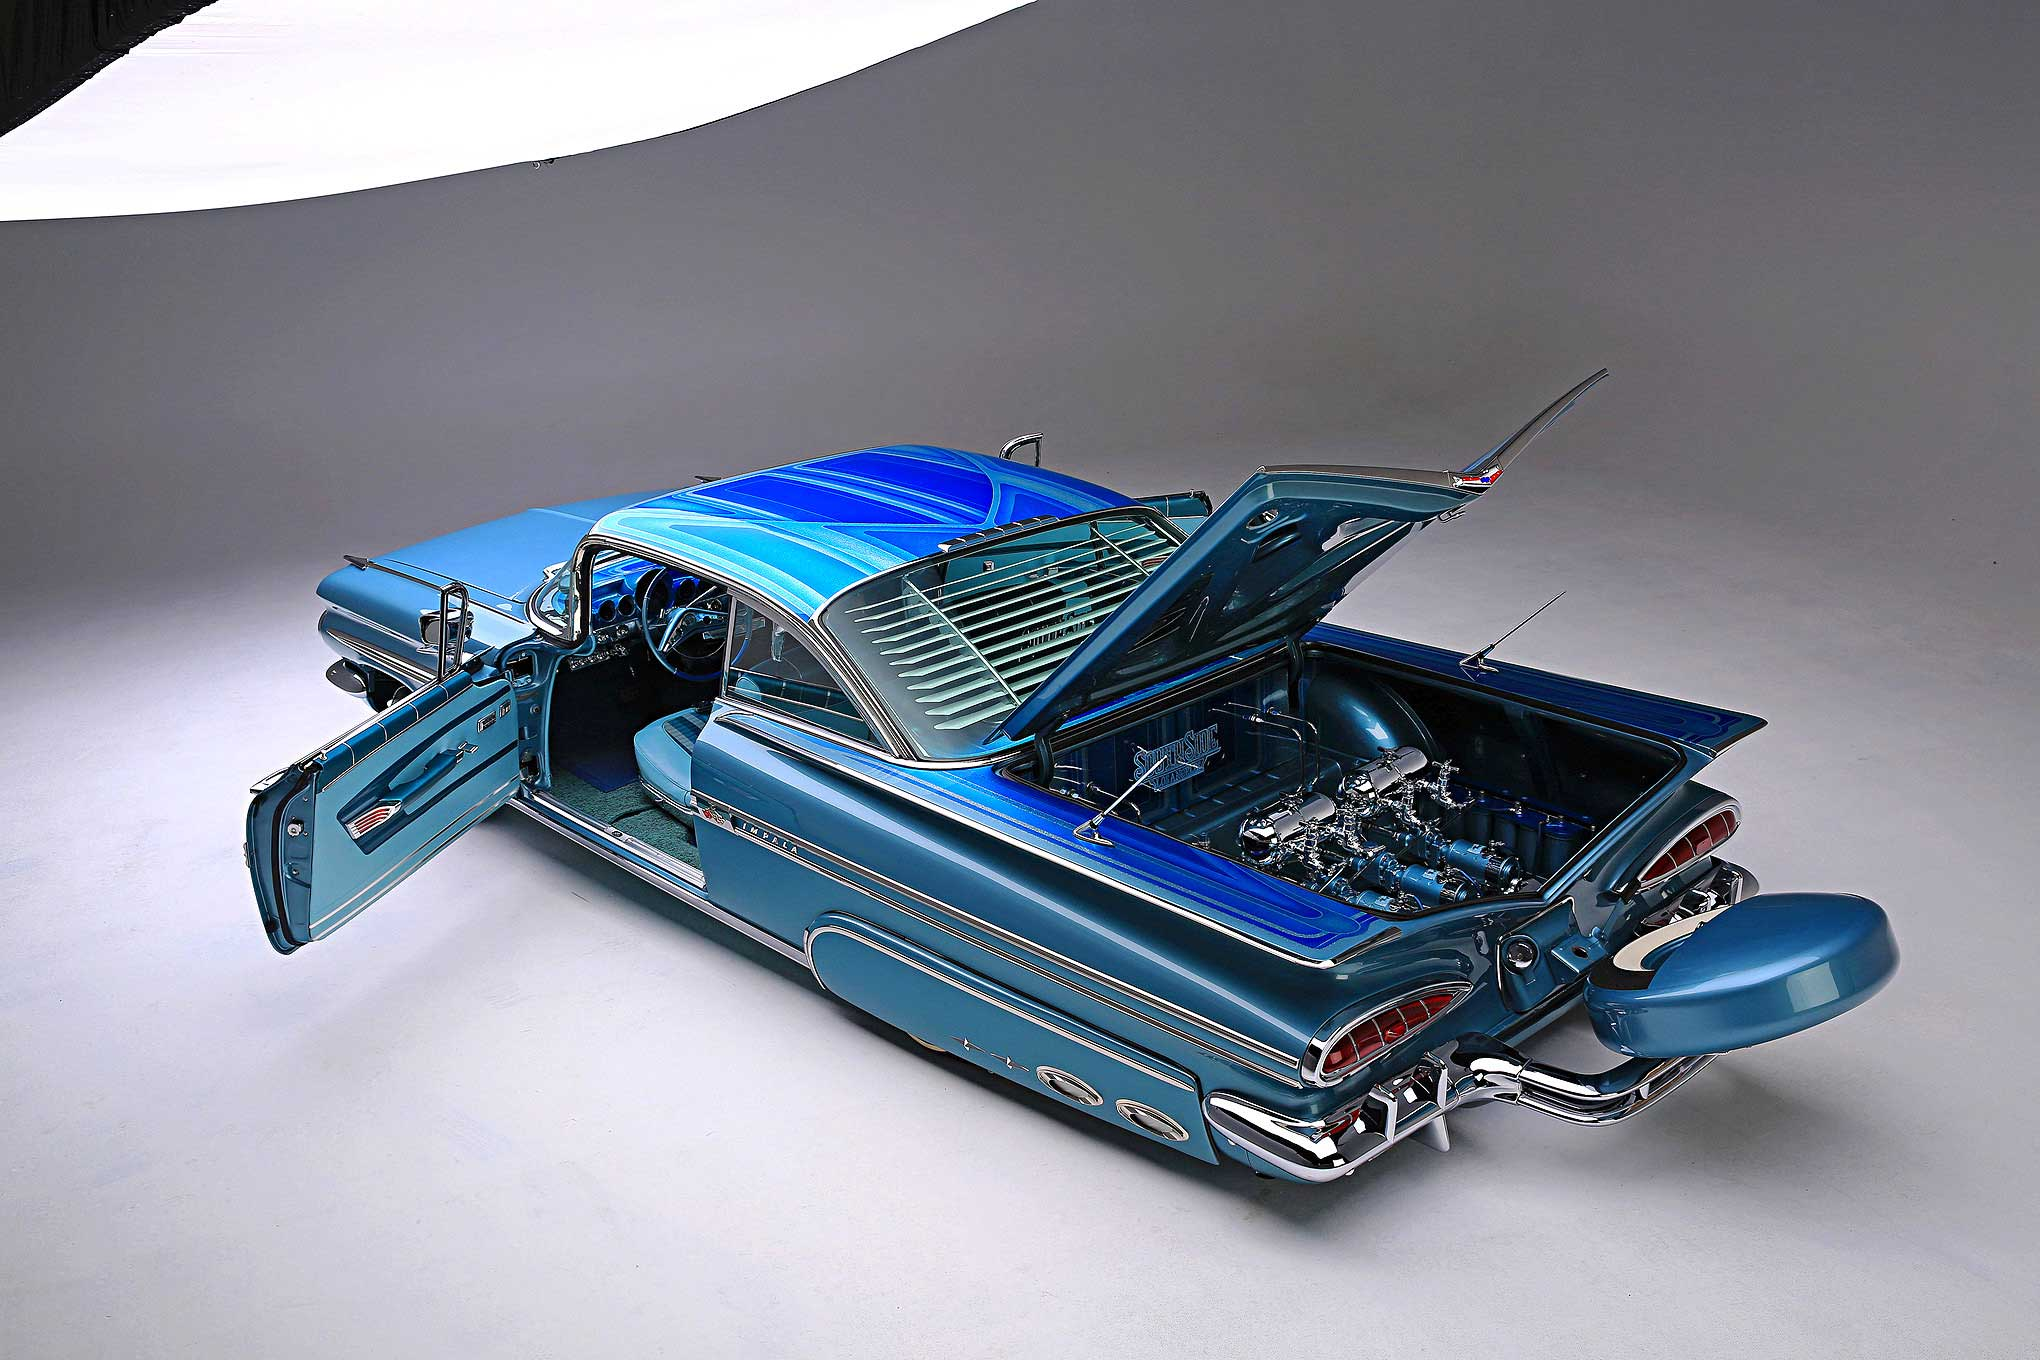 1959 Chevrolet Impala Built In Tijuana Chevy Rear Wiring Harness 58 72